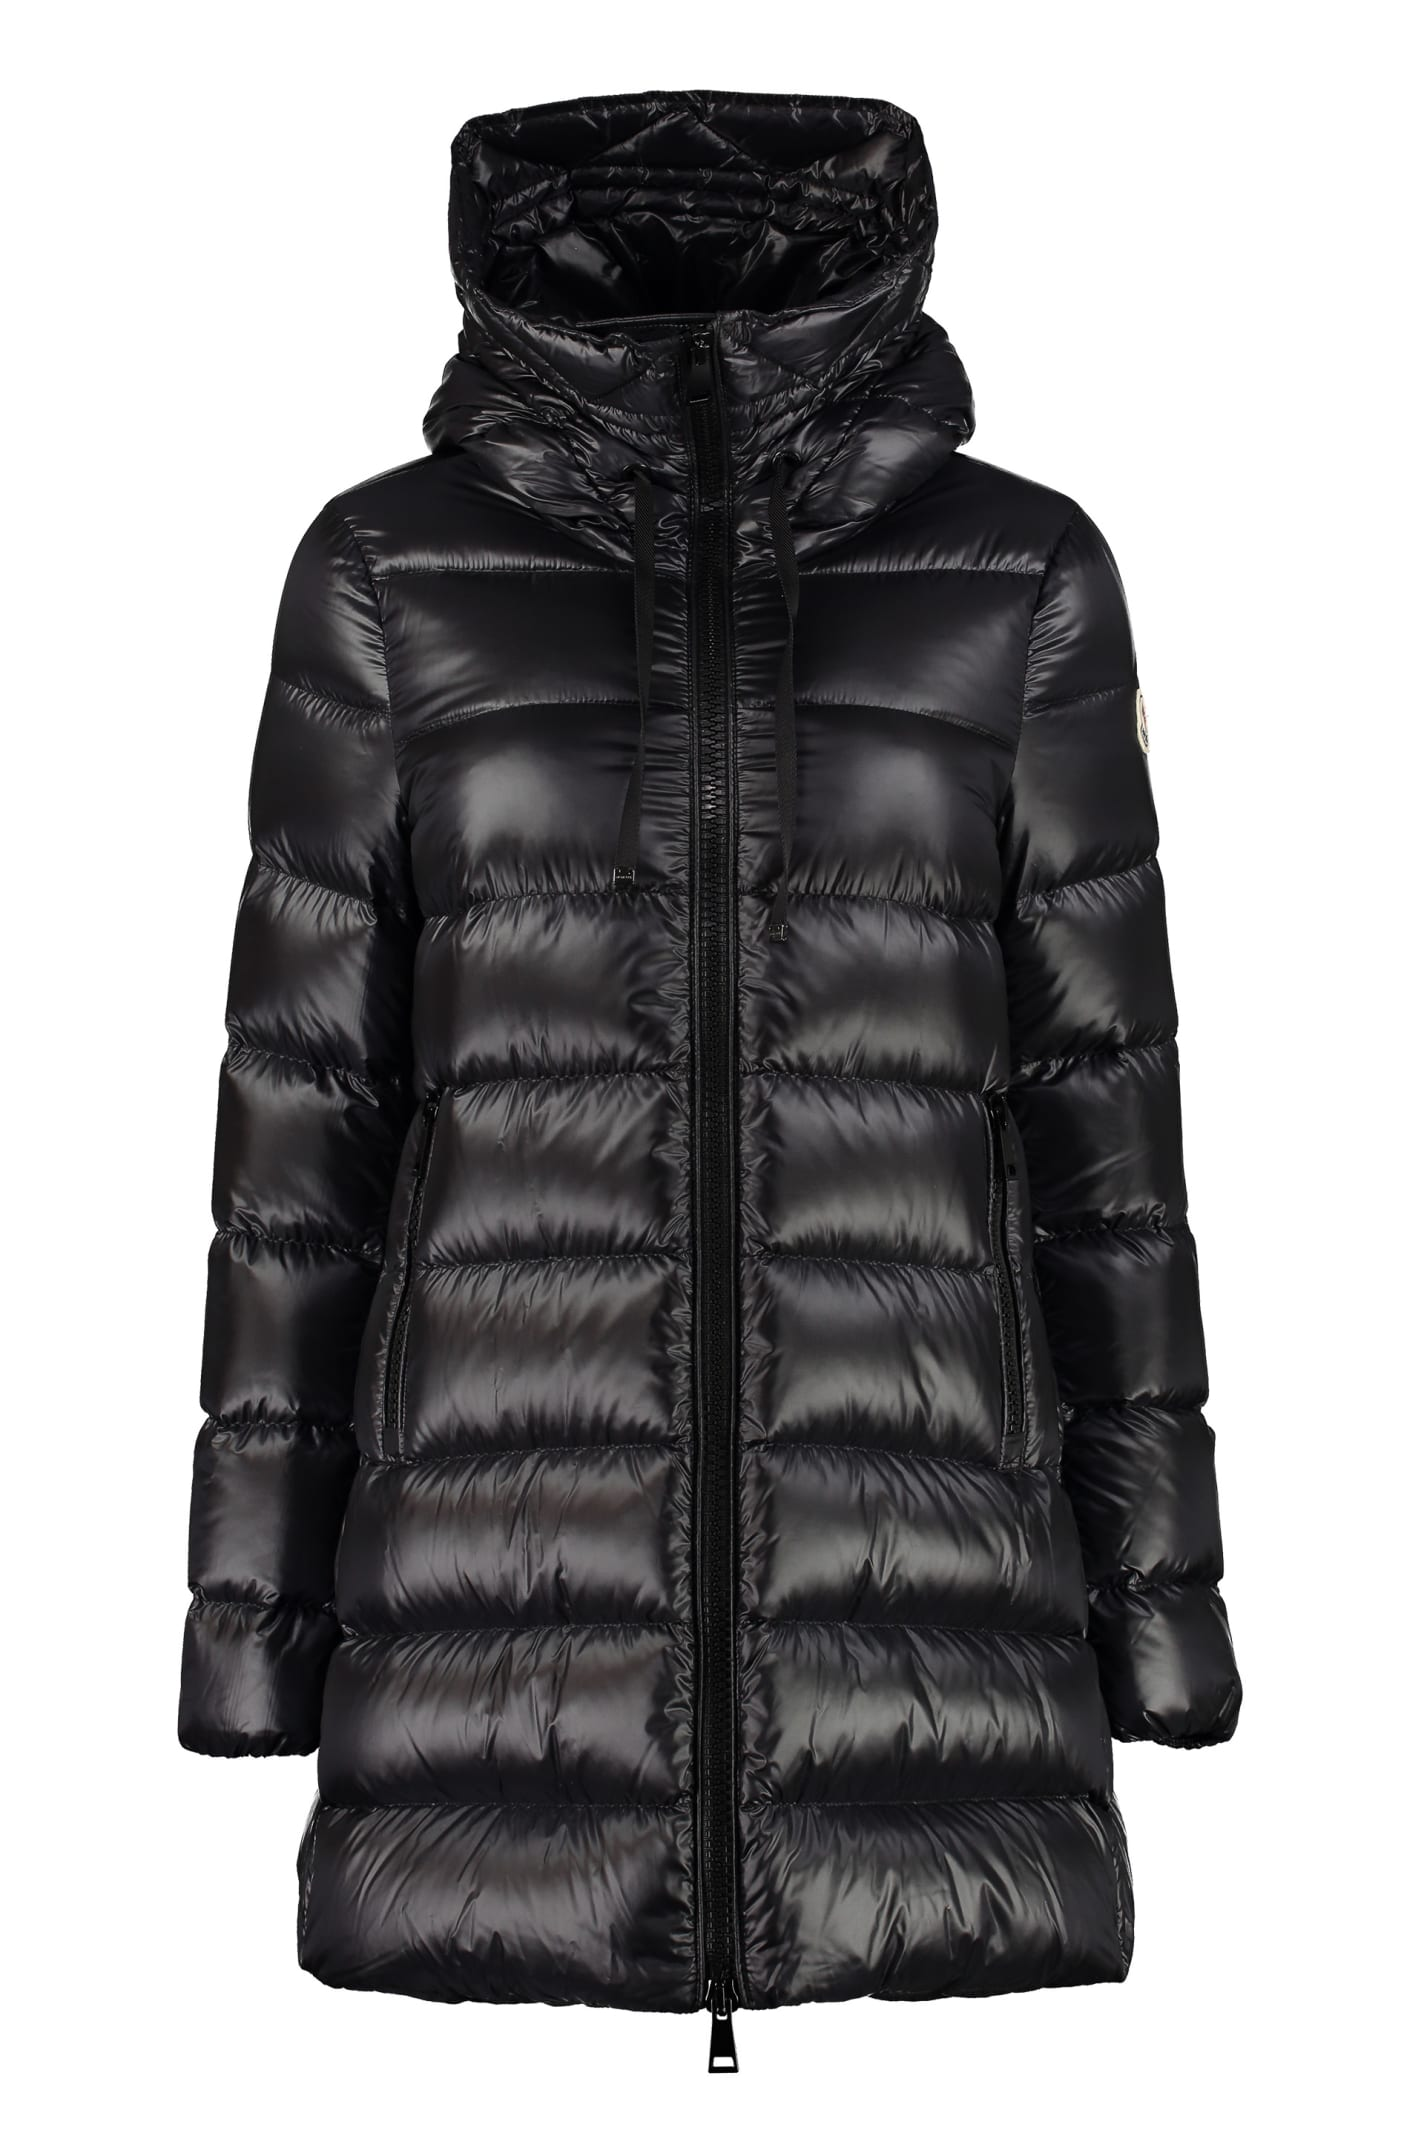 Moncler Suyen Full Zip Padded Hooded Jacket